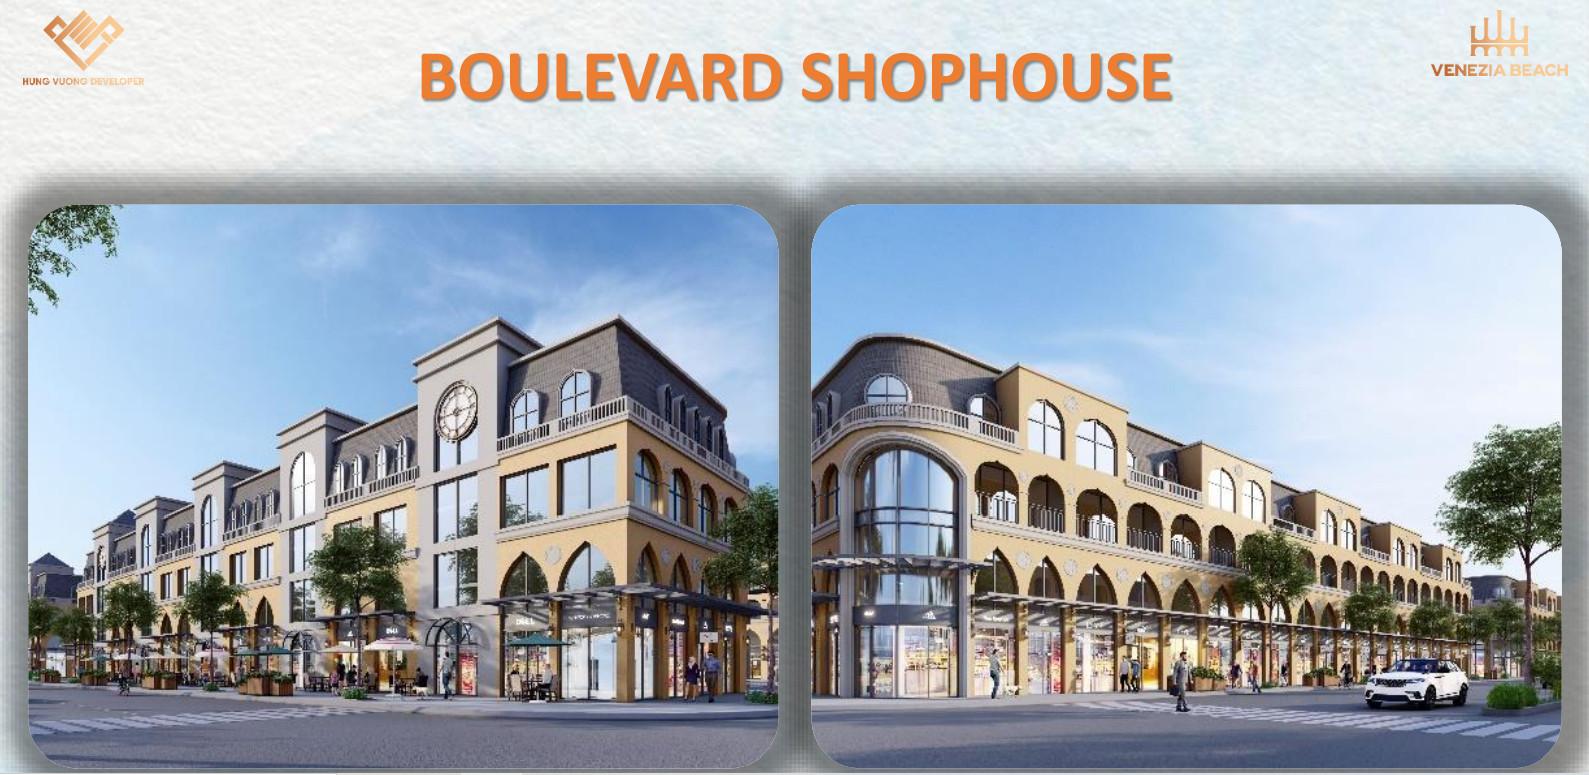 Phối cảnh mẫu nhà Boulevera shophouse Venezia Beach phân khu The Venice